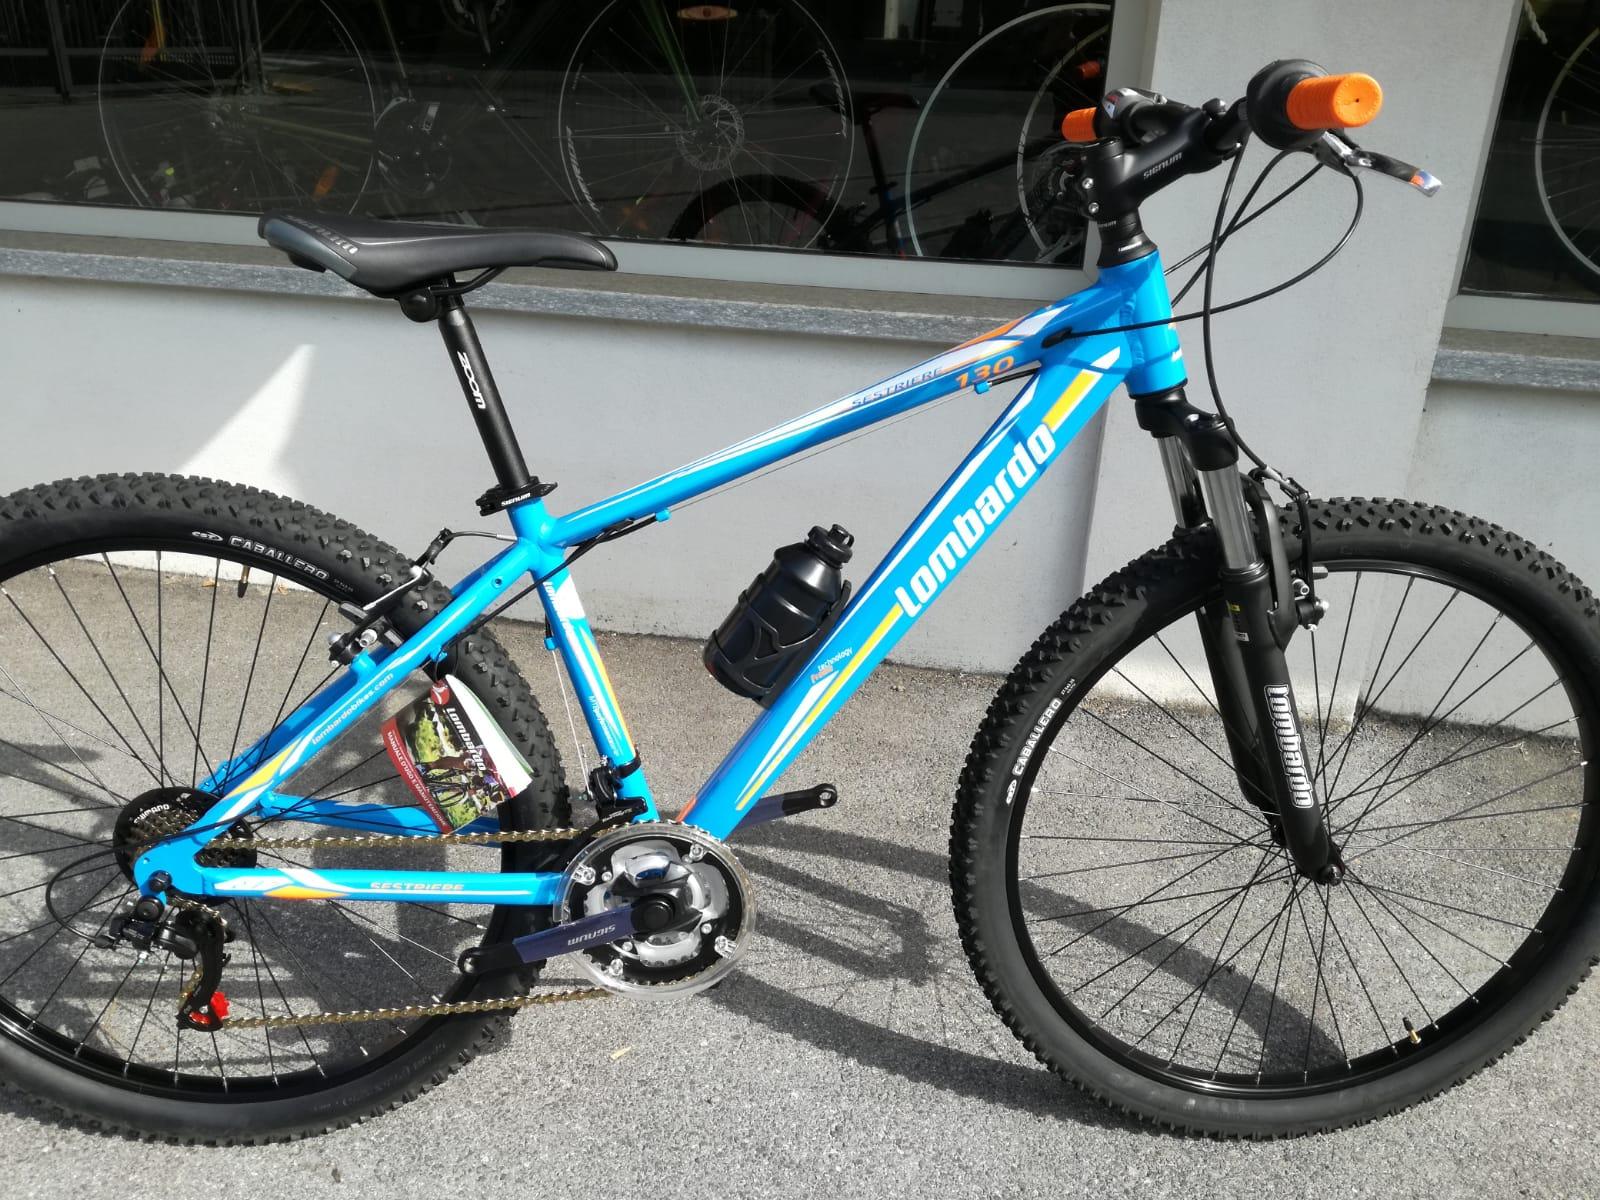 mtb mountail bike lombardo sestriere 130